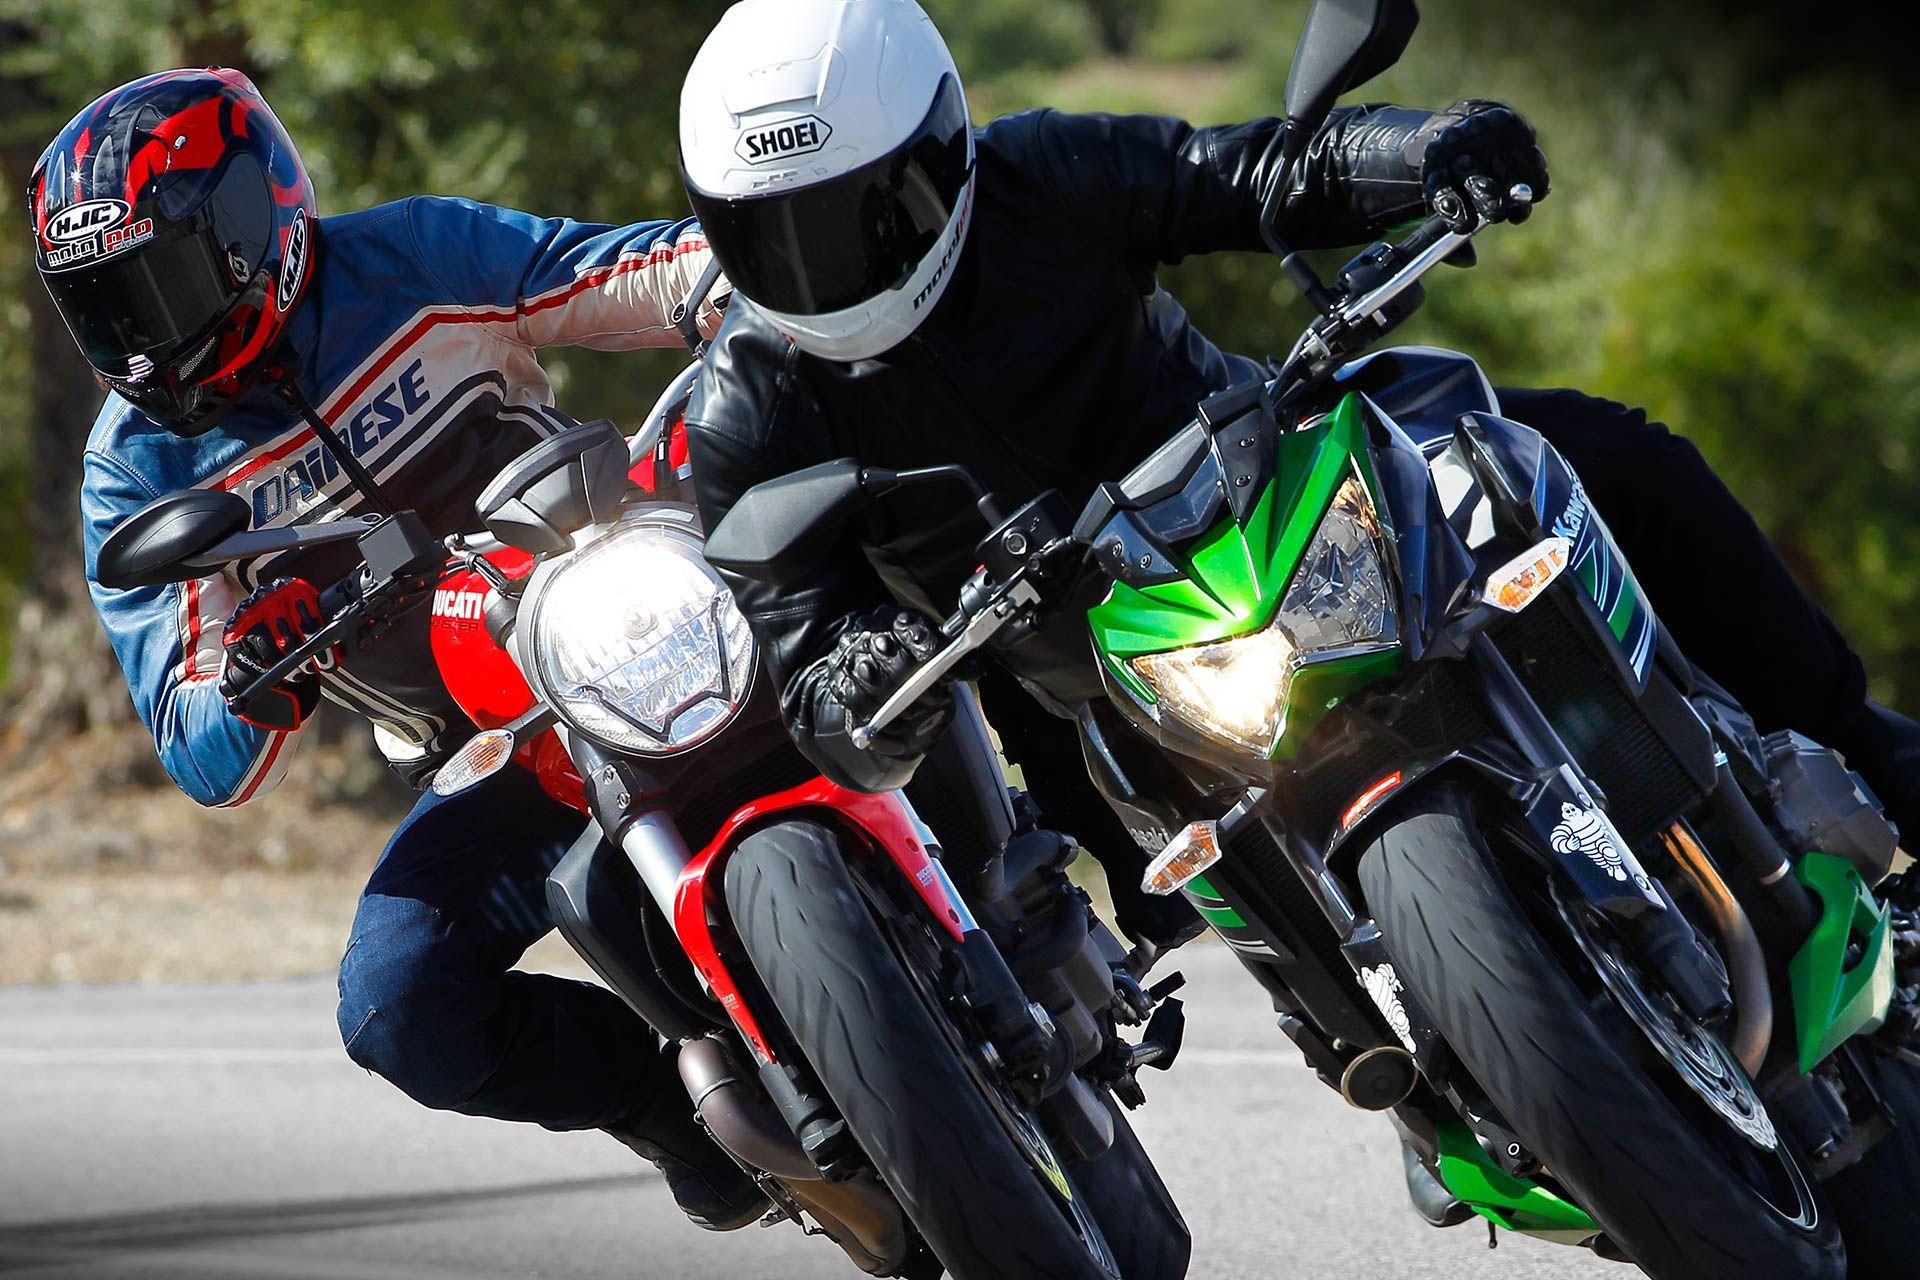 SWM Ace of Spades 125 2019 | Moto1Pro in 2020 | Ace of